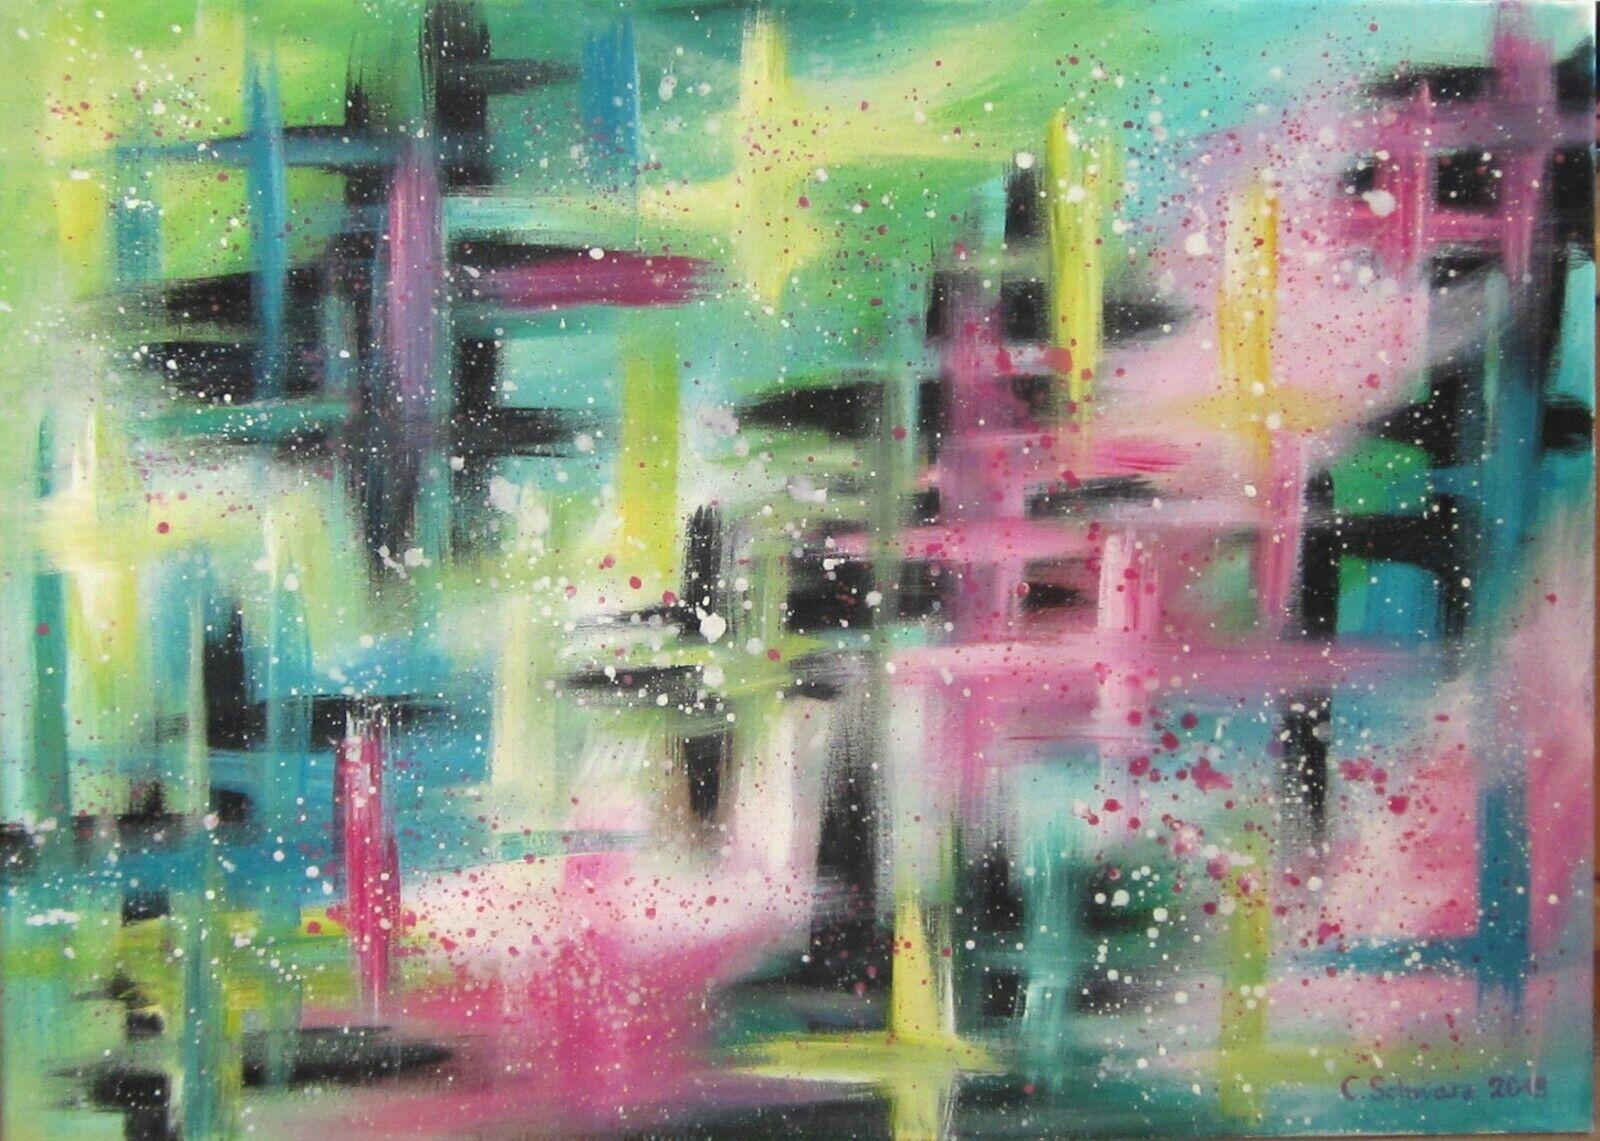 Abstraktes Acrylgemälde auf Leinwand, Wandbild, moderne Malerei, Bild, bunt Deko